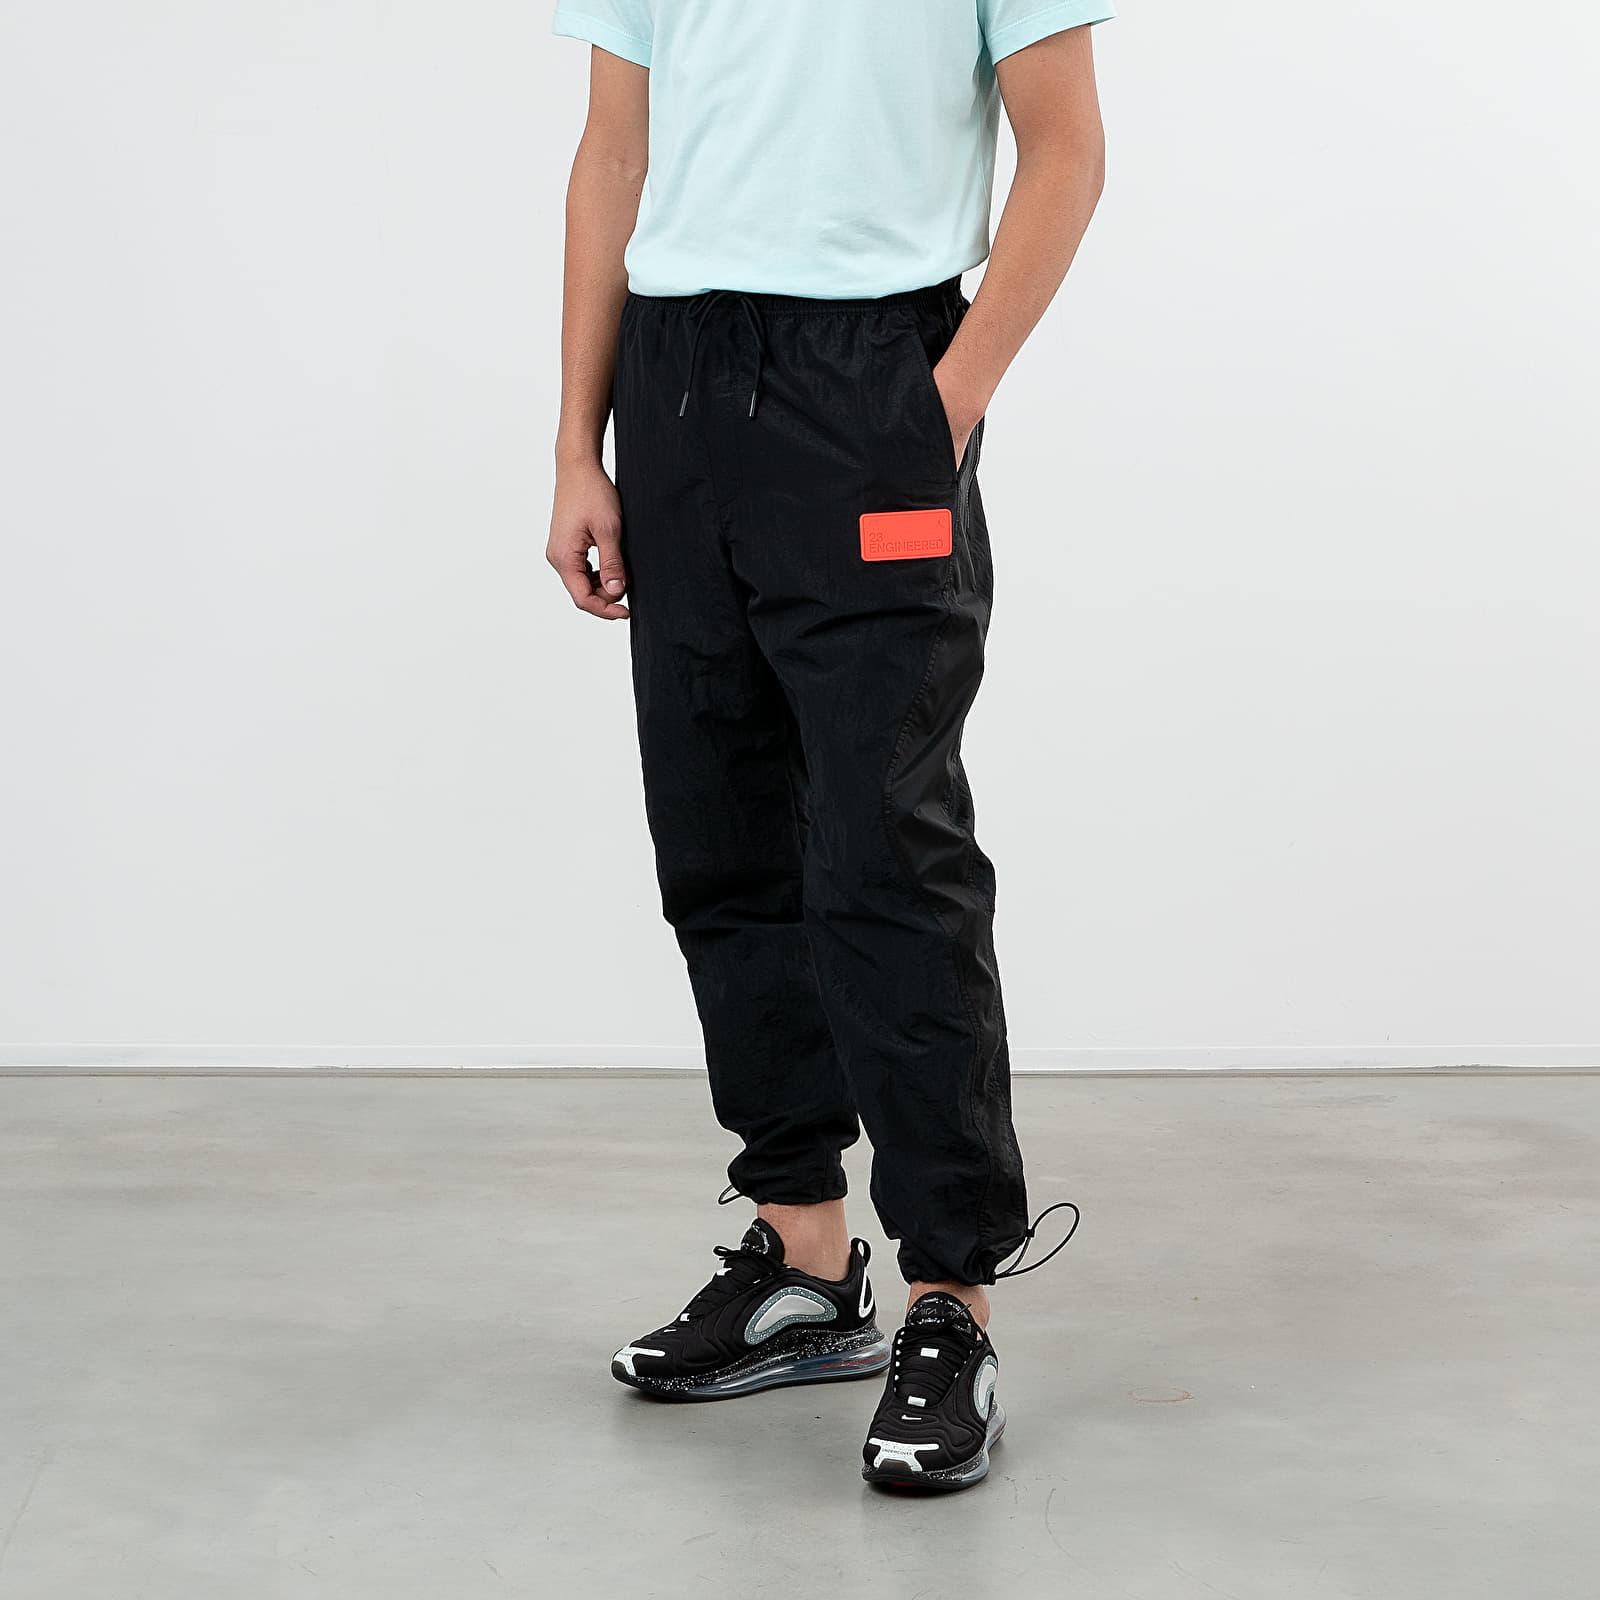 Hosen und Jeans Jordan 23 Engineered Nylon Pants Black/ Infrared 23